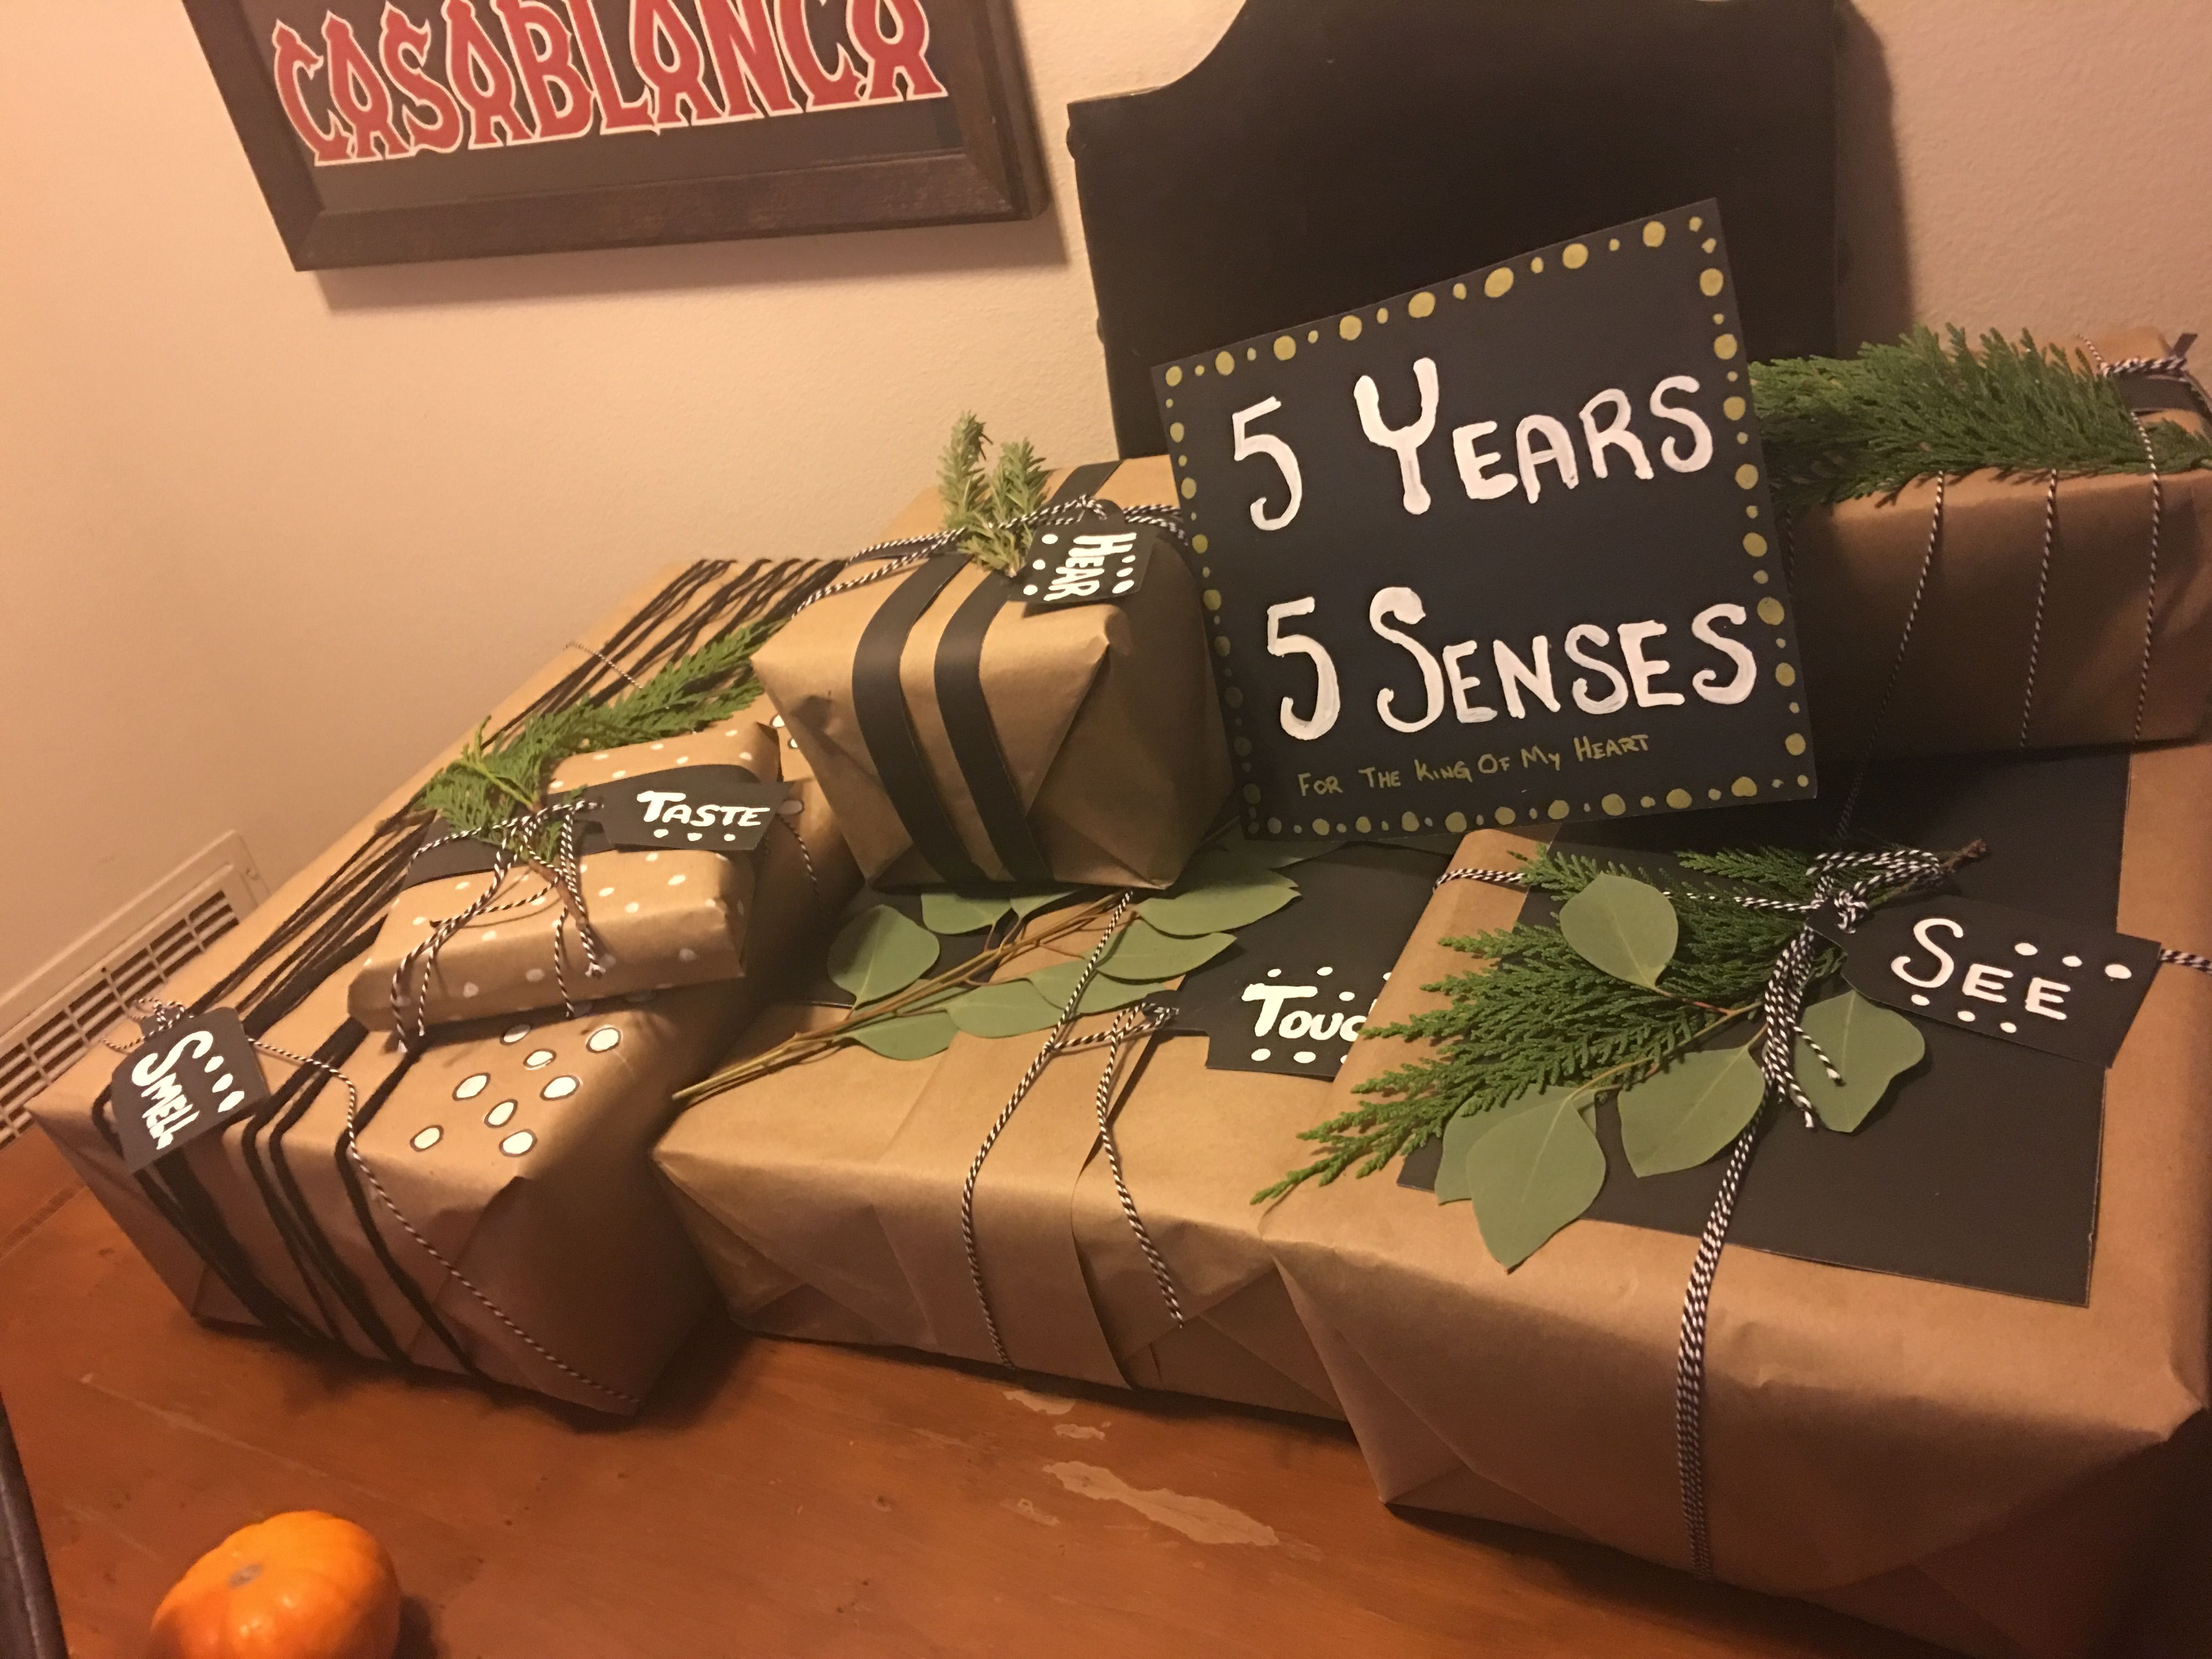 5 senses gift for him 5 year anniversary 5 year